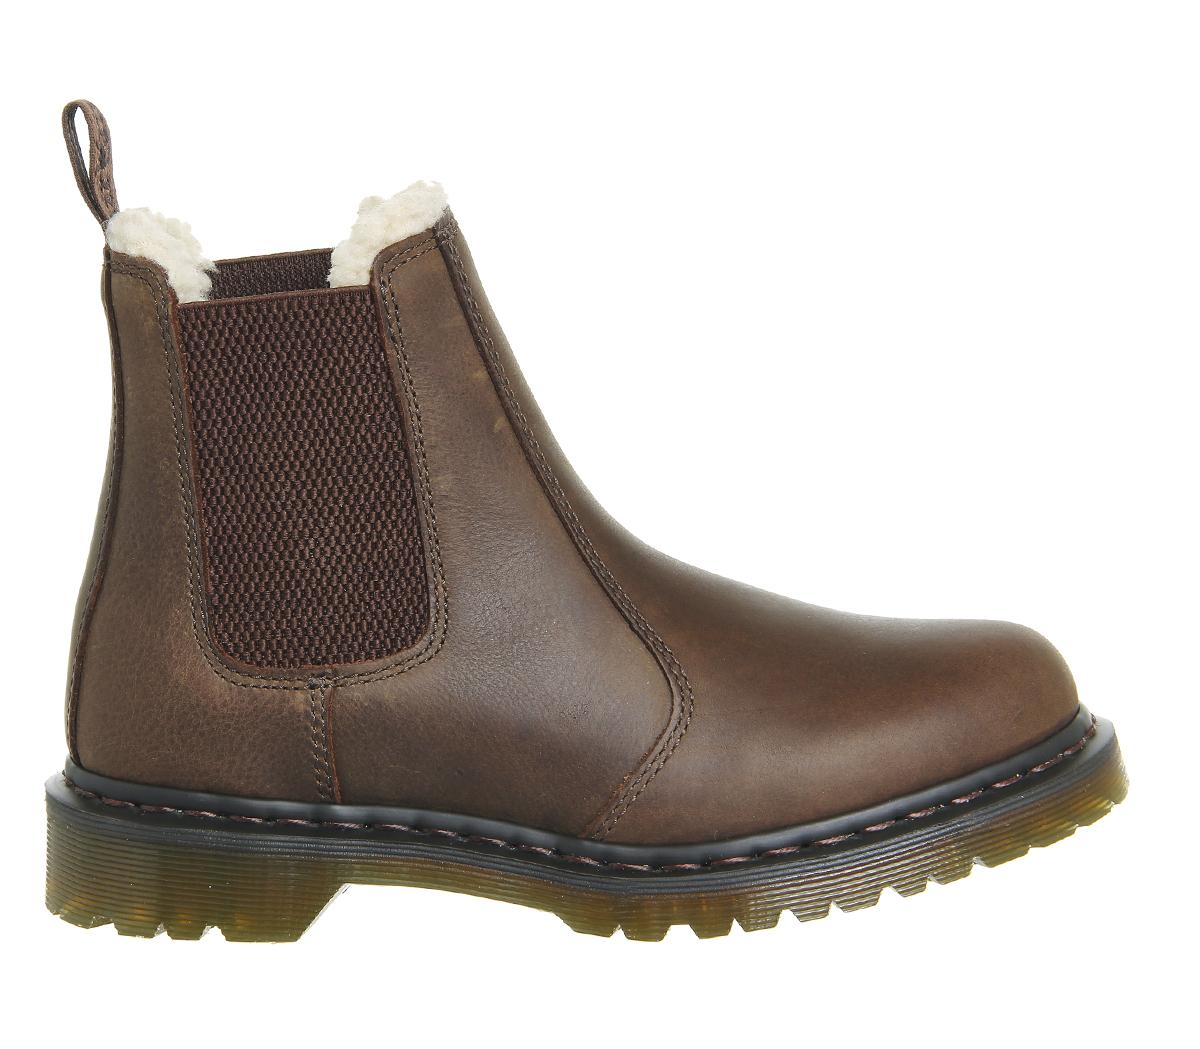 dr martens leonore boots in brown for men lyst. Black Bedroom Furniture Sets. Home Design Ideas